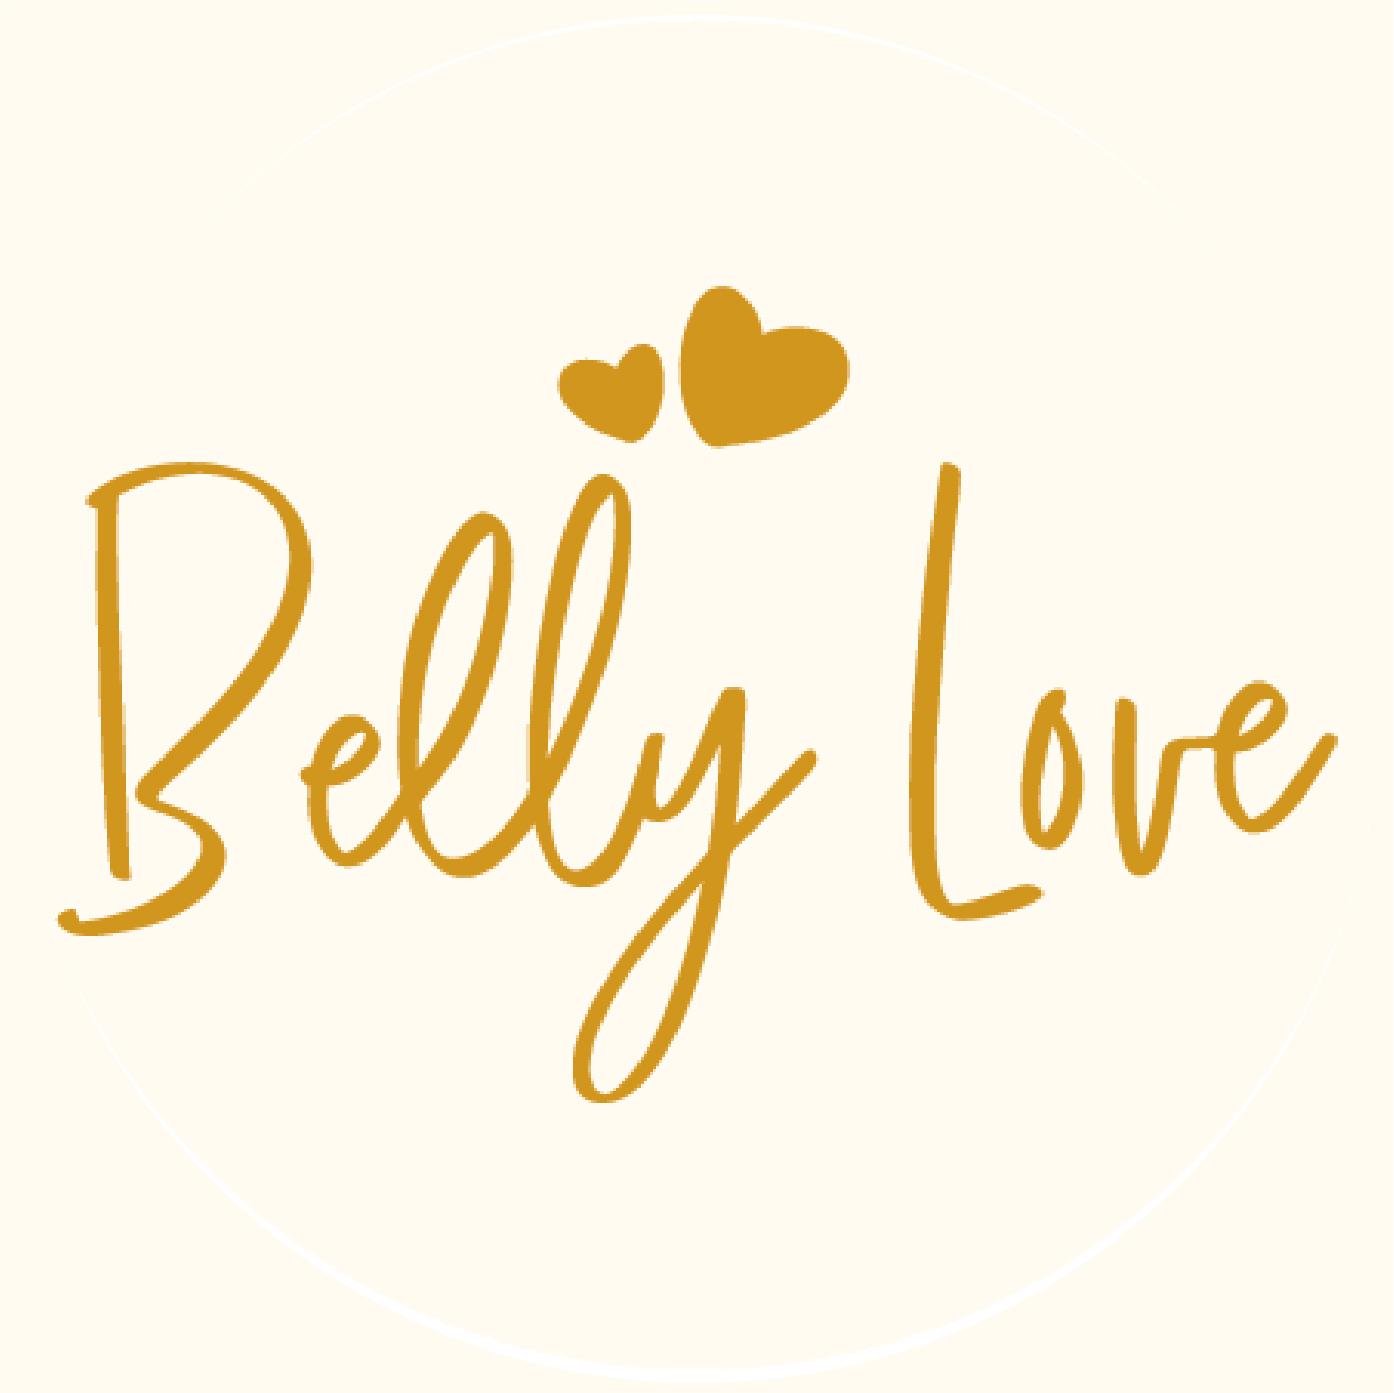 Belly Love